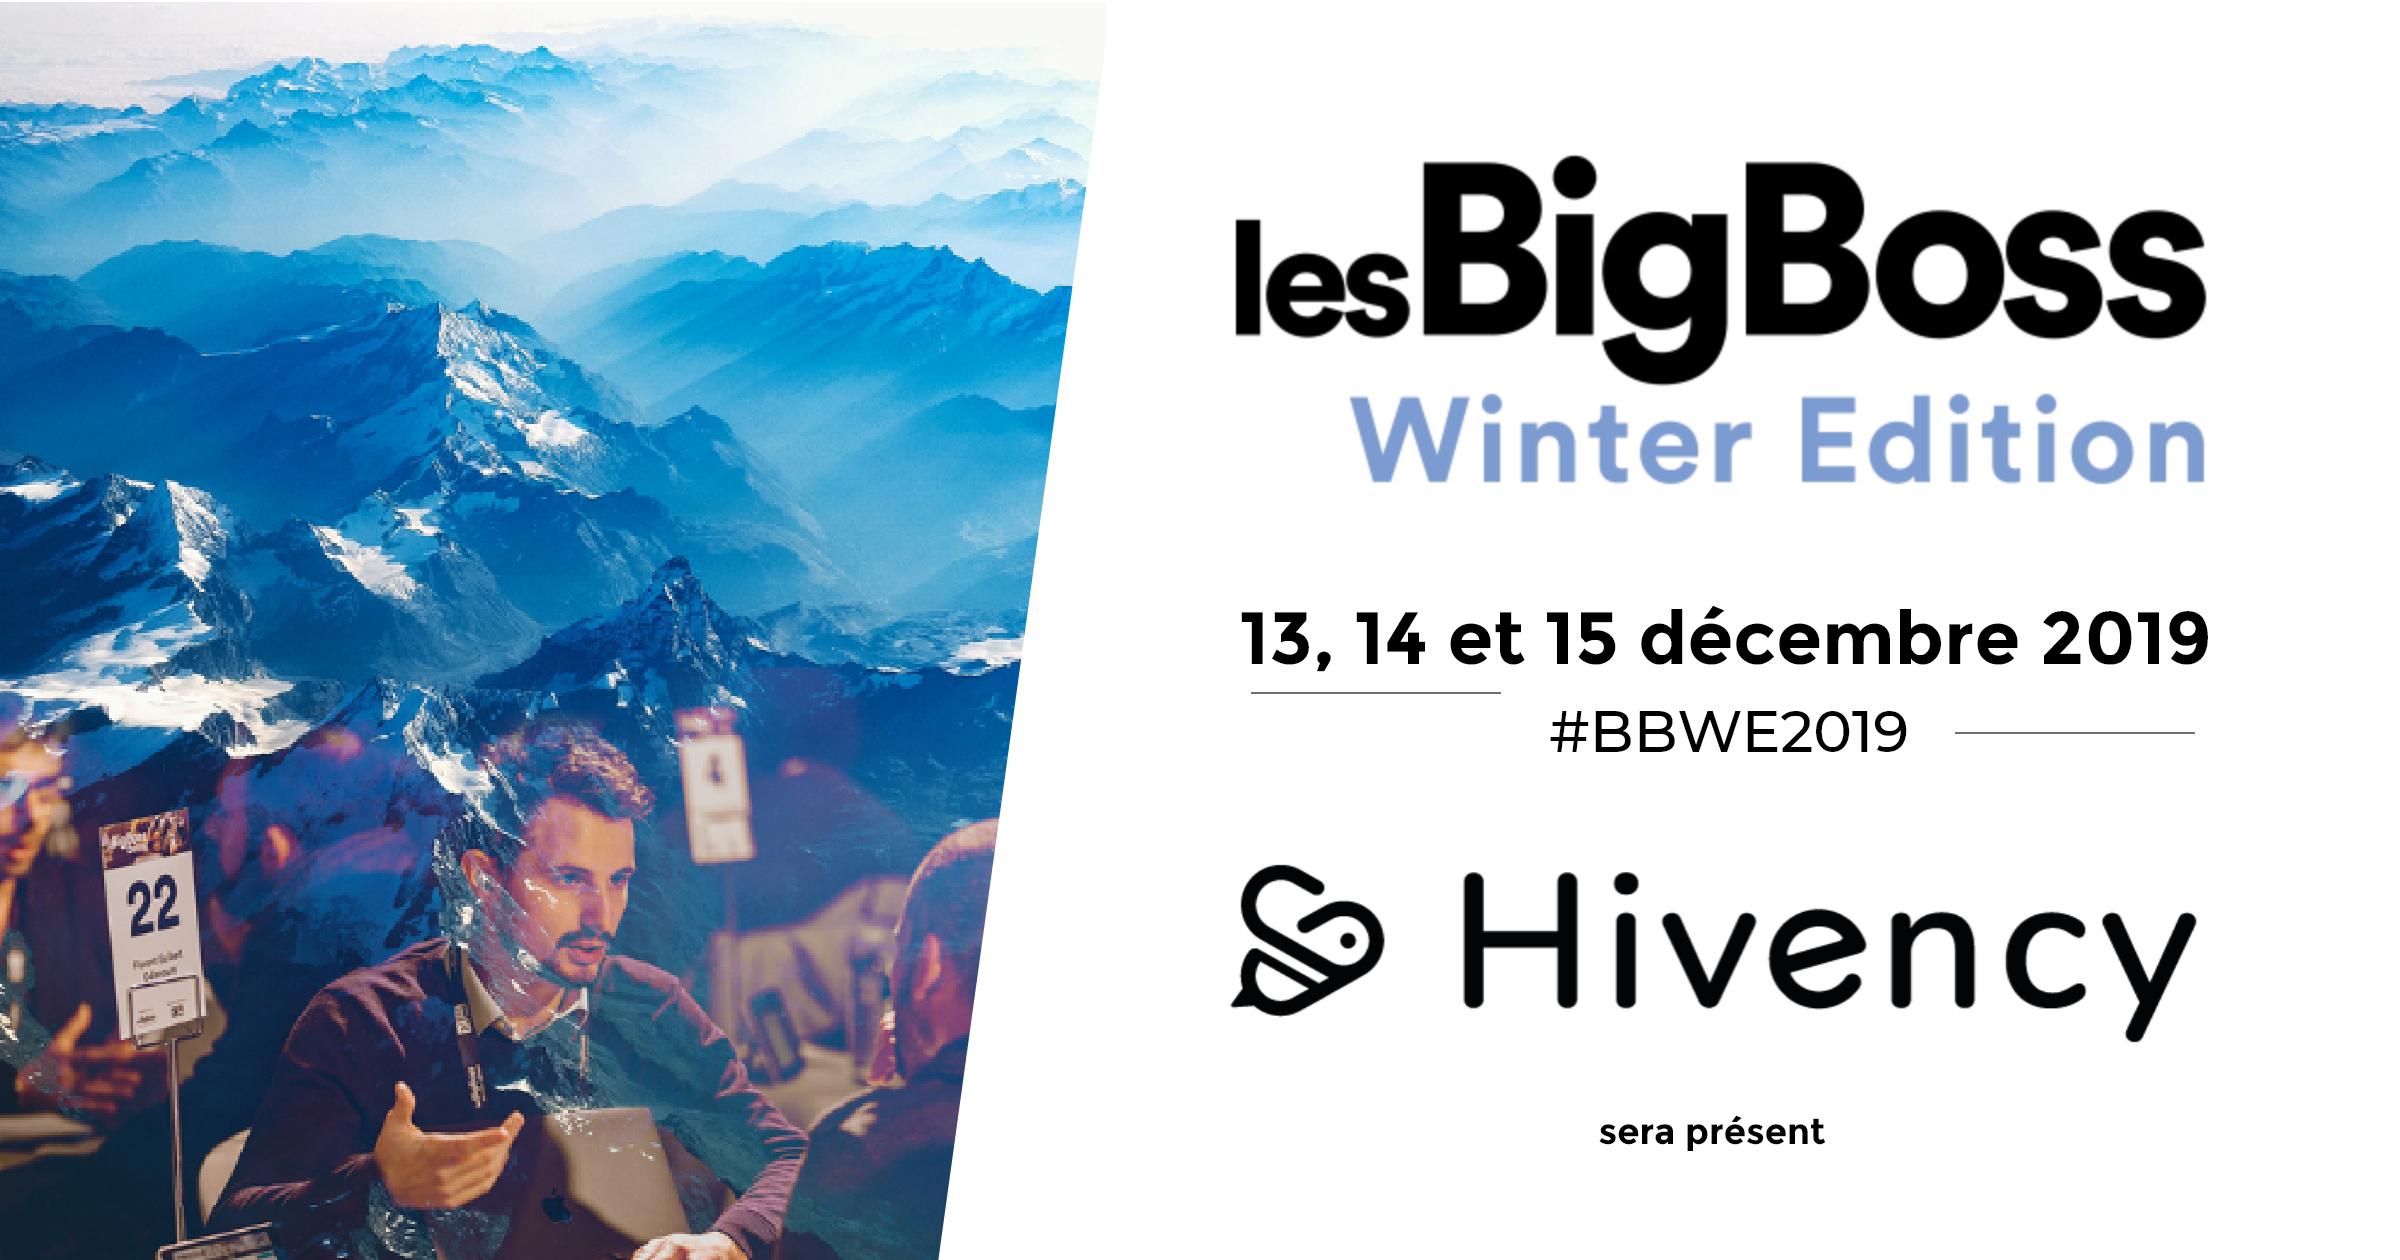 bigboss winter edition hivency